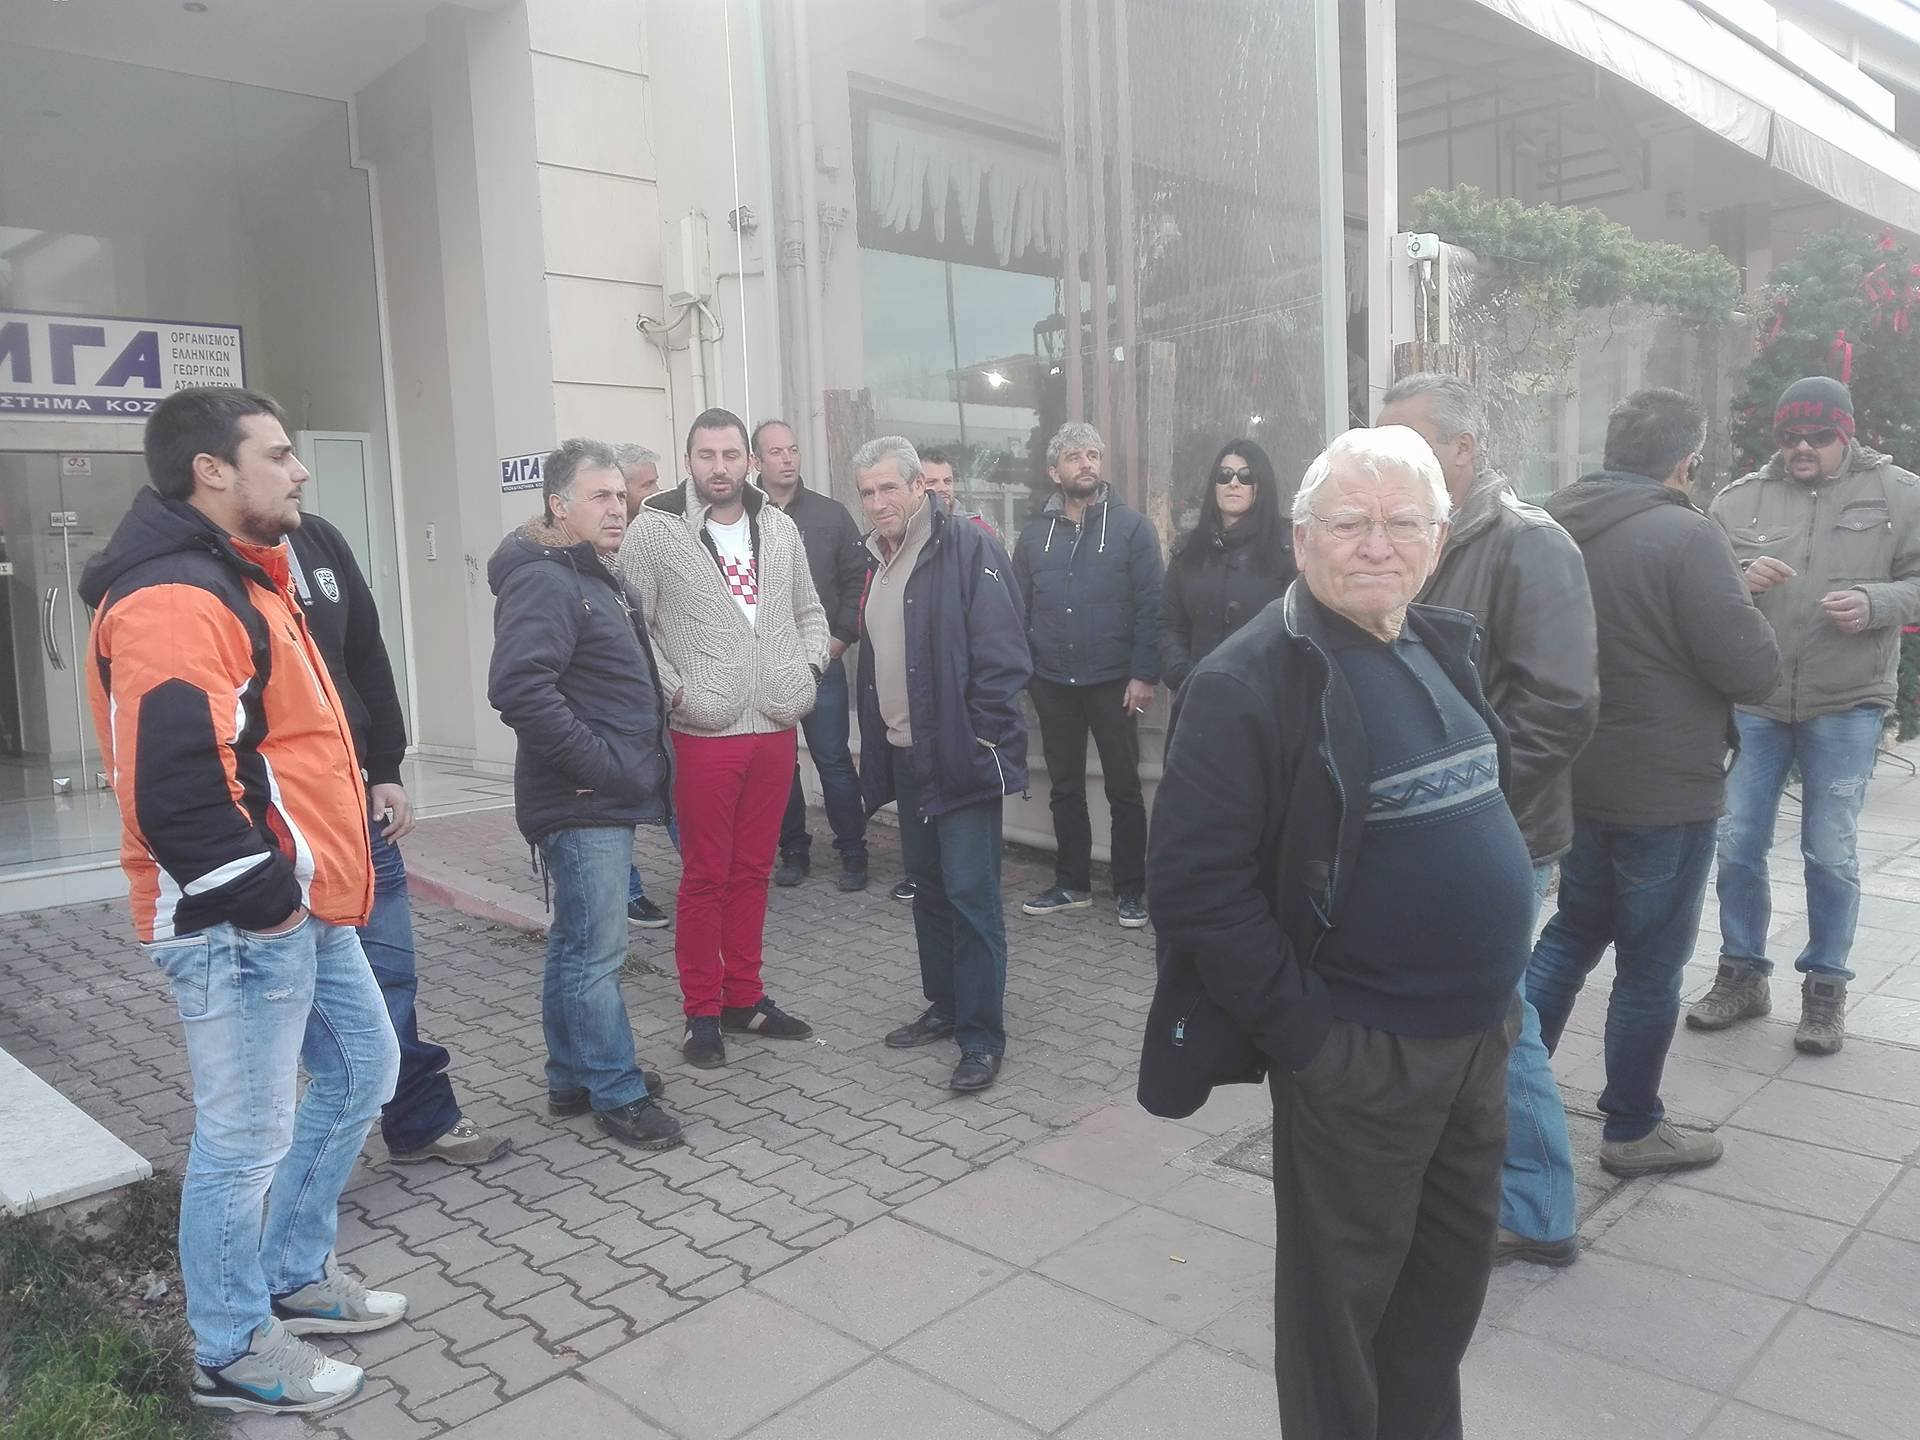 kozan.gr: Διαμαρτυρία αγροτών έξω από το υποκατάστημα του ΕΛΓΑ στην Κοζάνη (Φωτογραφίες & Βίντεο)